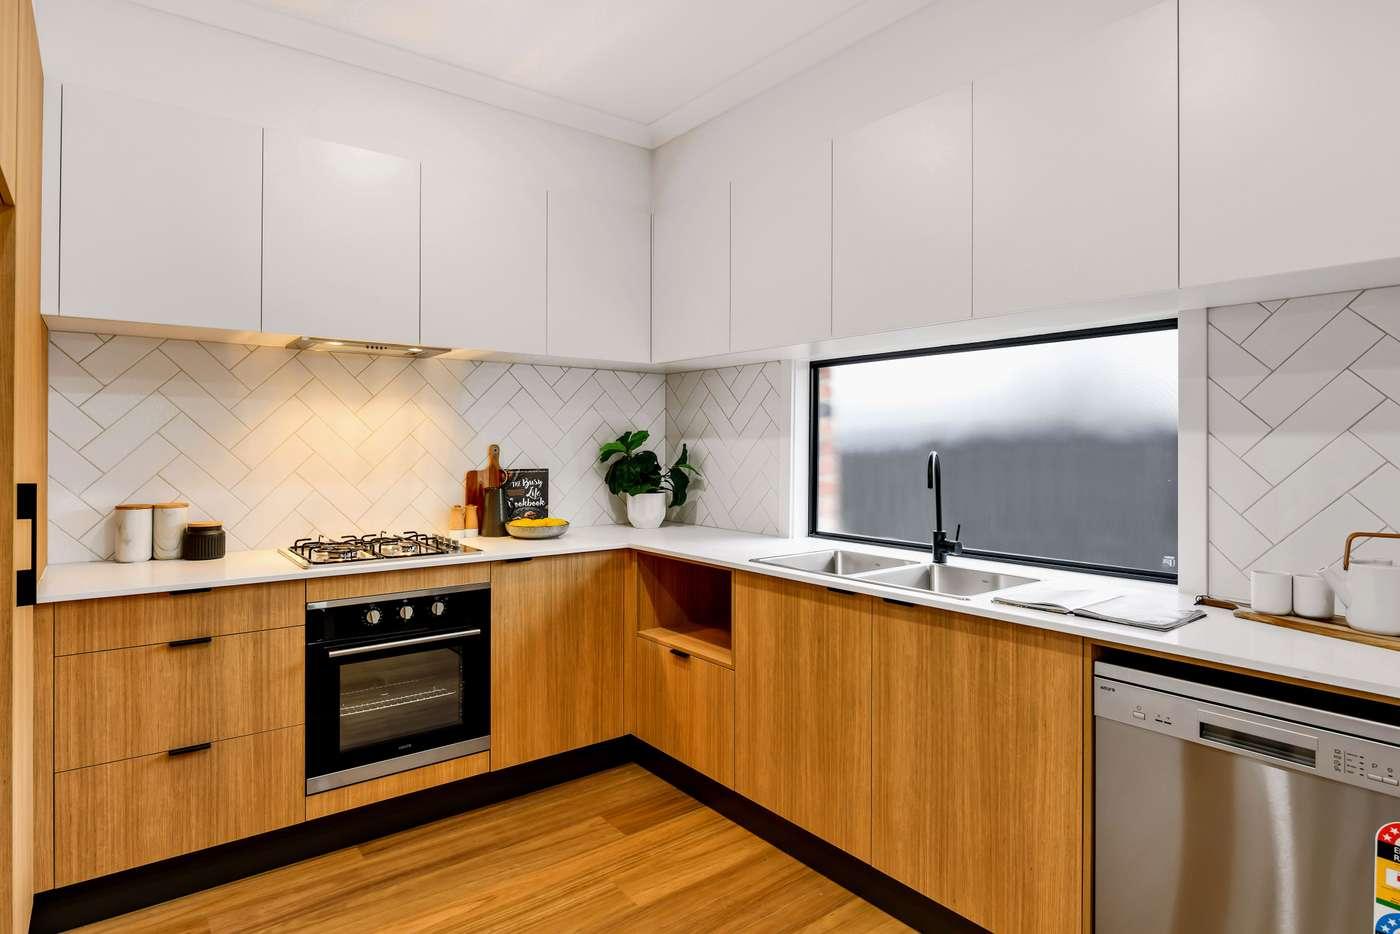 Sixth view of Homely house listing, 9/118 Hawker Street, Ridleyton SA 5008